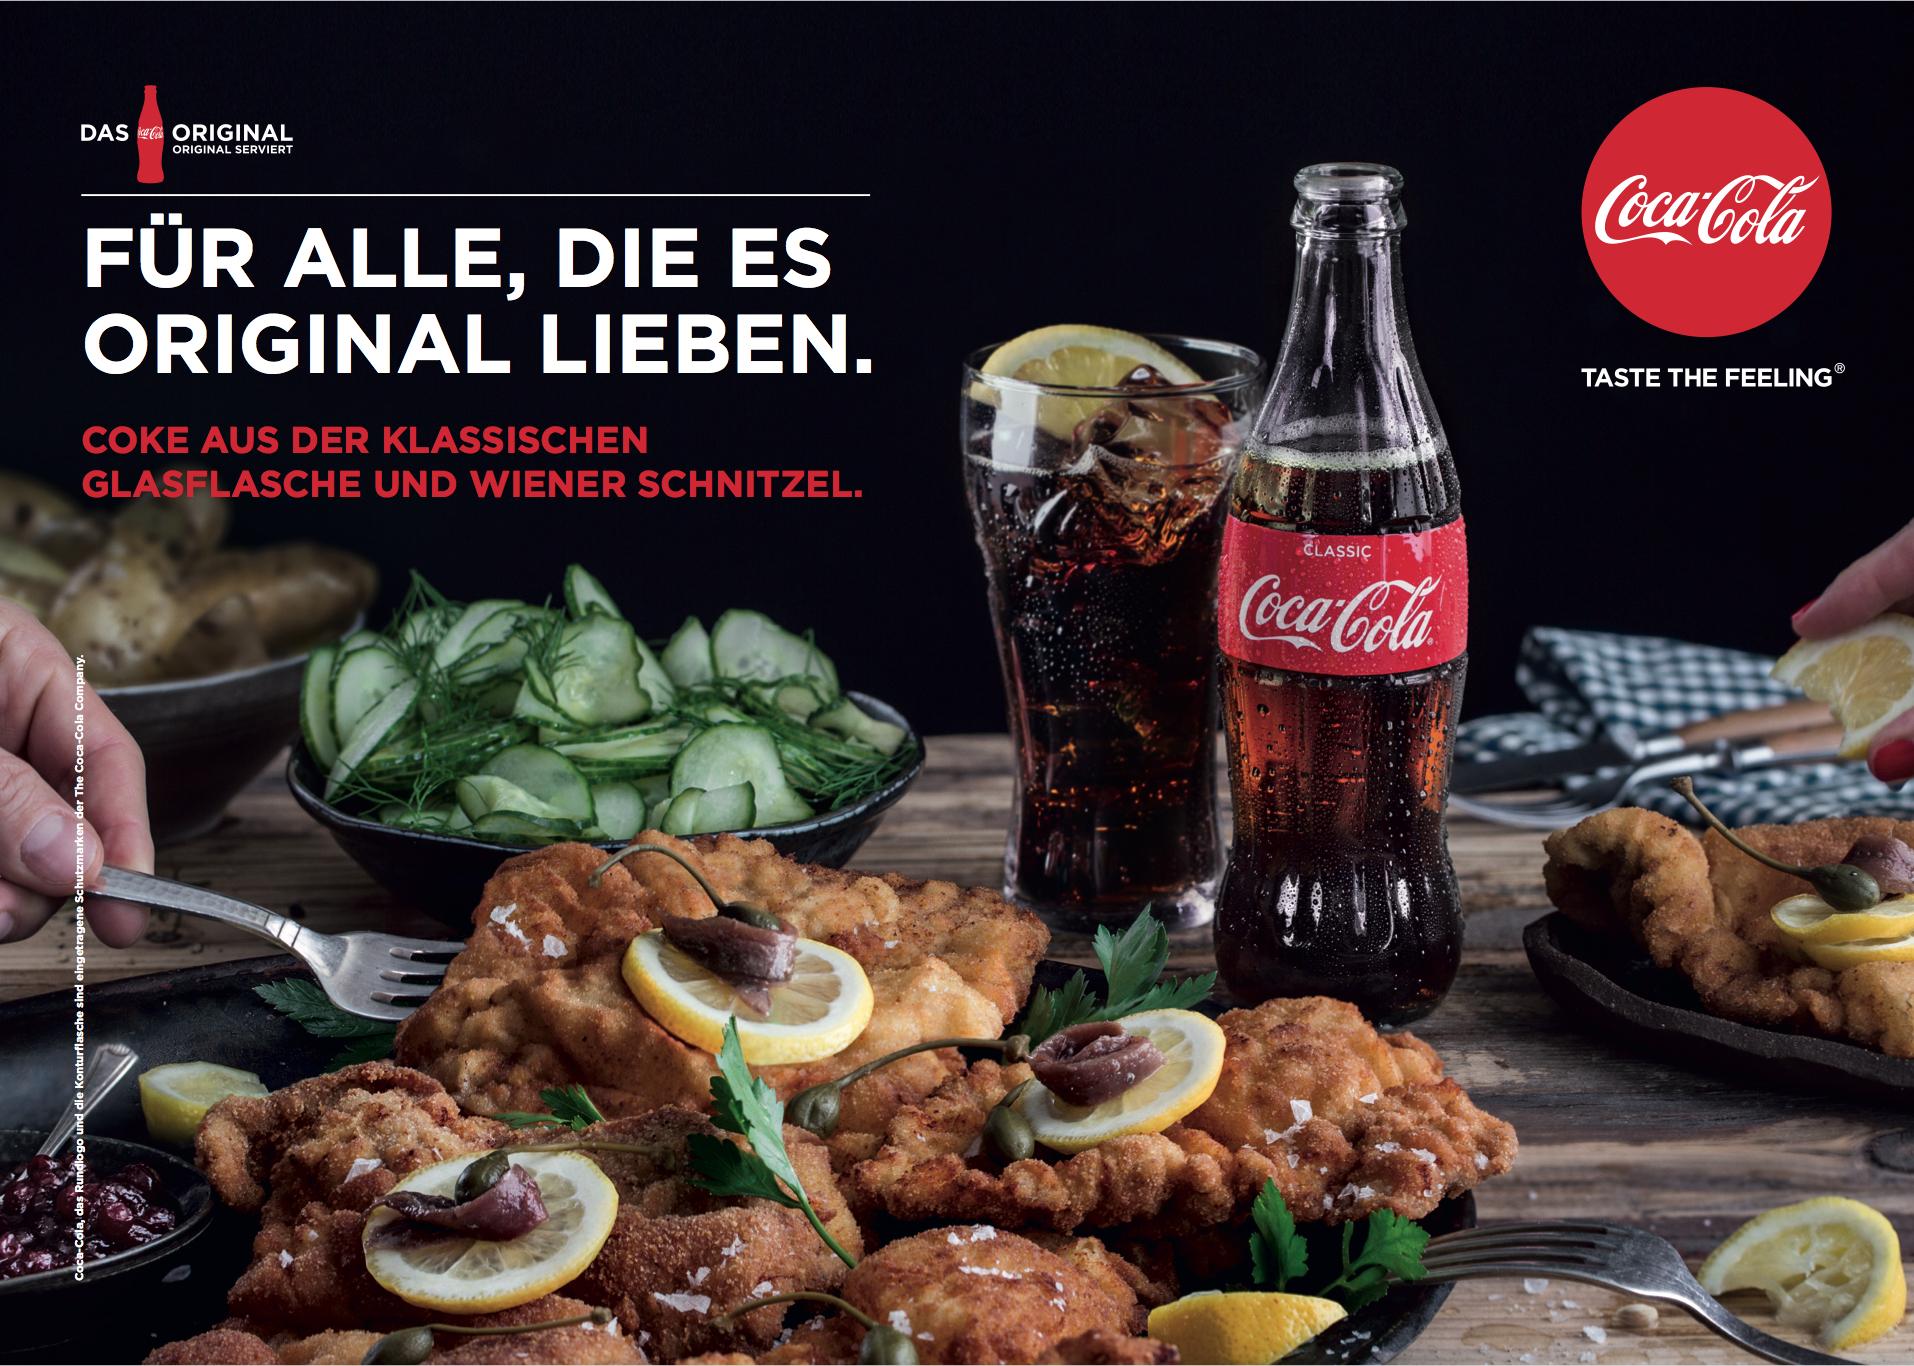 Coke_Schnitzel_paulapetersen.jpg